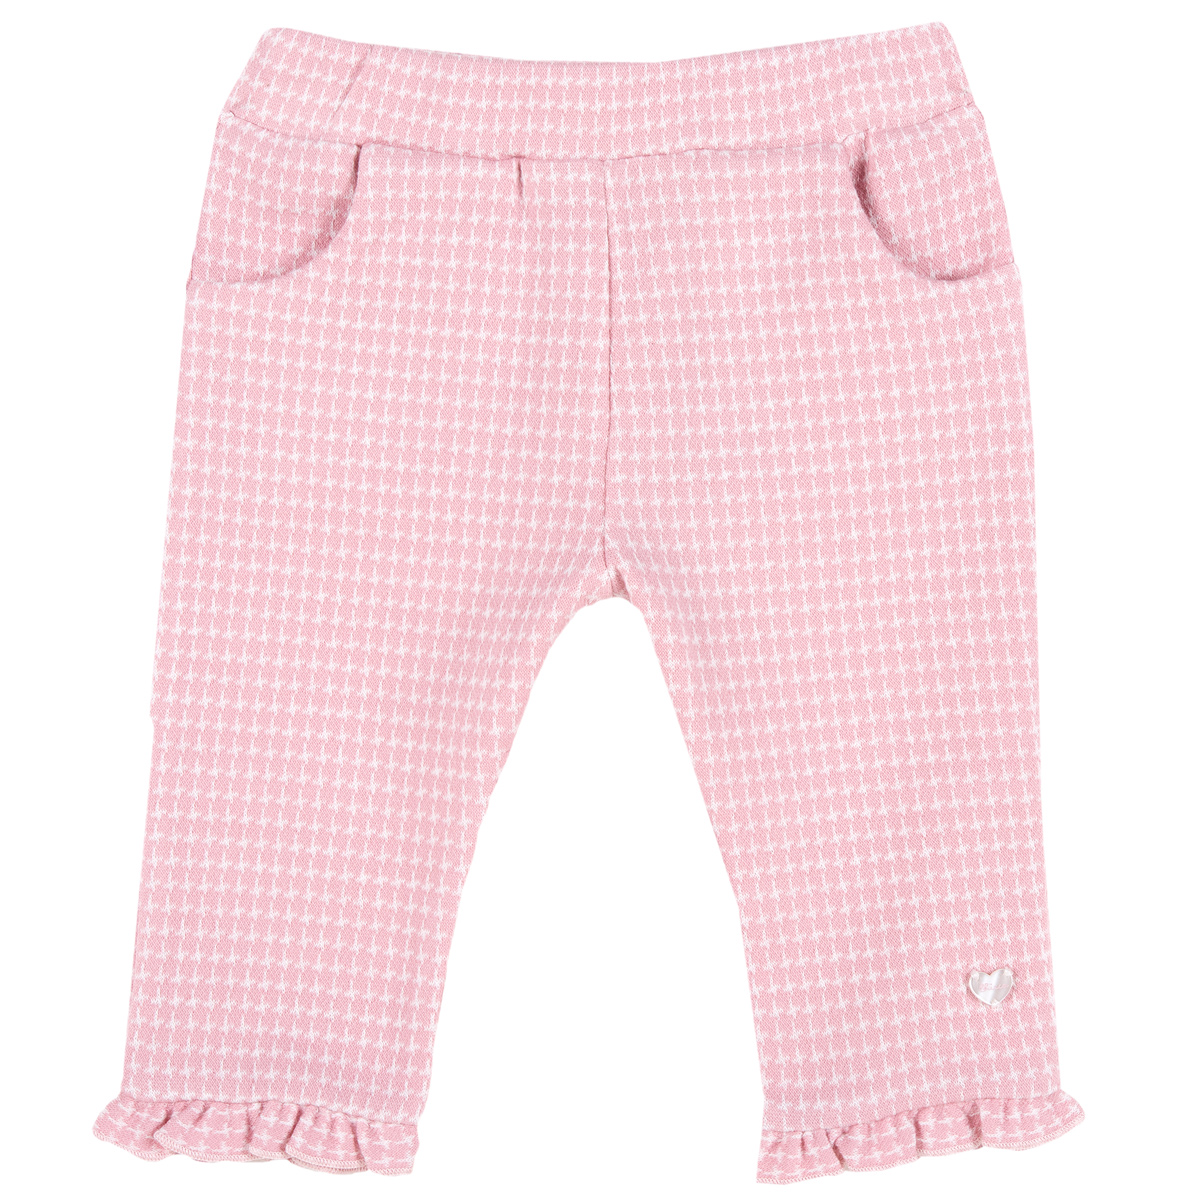 Pantaloni Lungi Copii Chicco, Volanas, Ciclamen, 08253 imagine